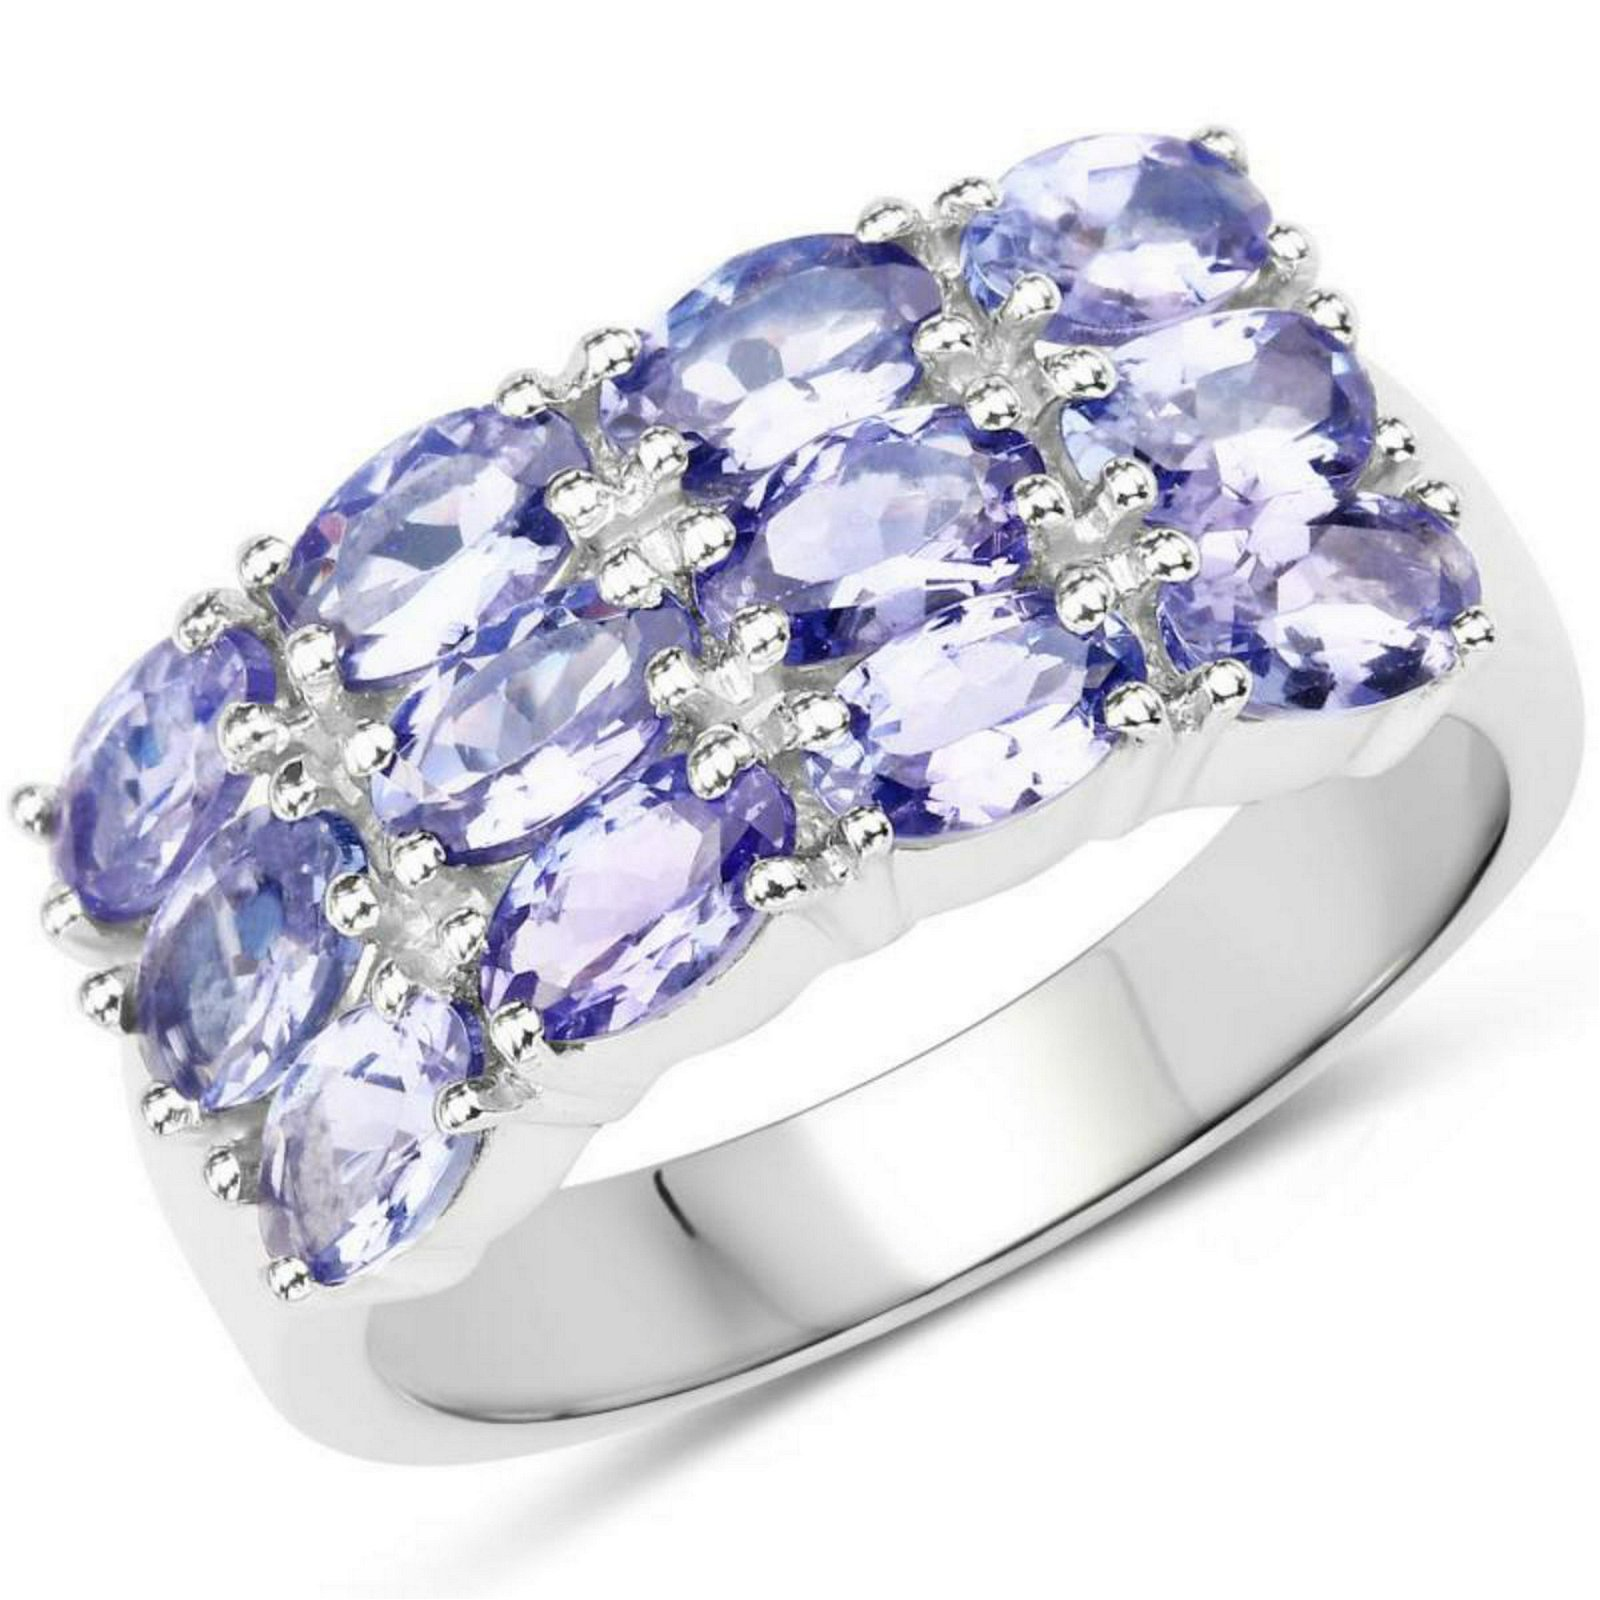 3 00 Carat Genuine Tanzanite  925 Sterling Silver Ring